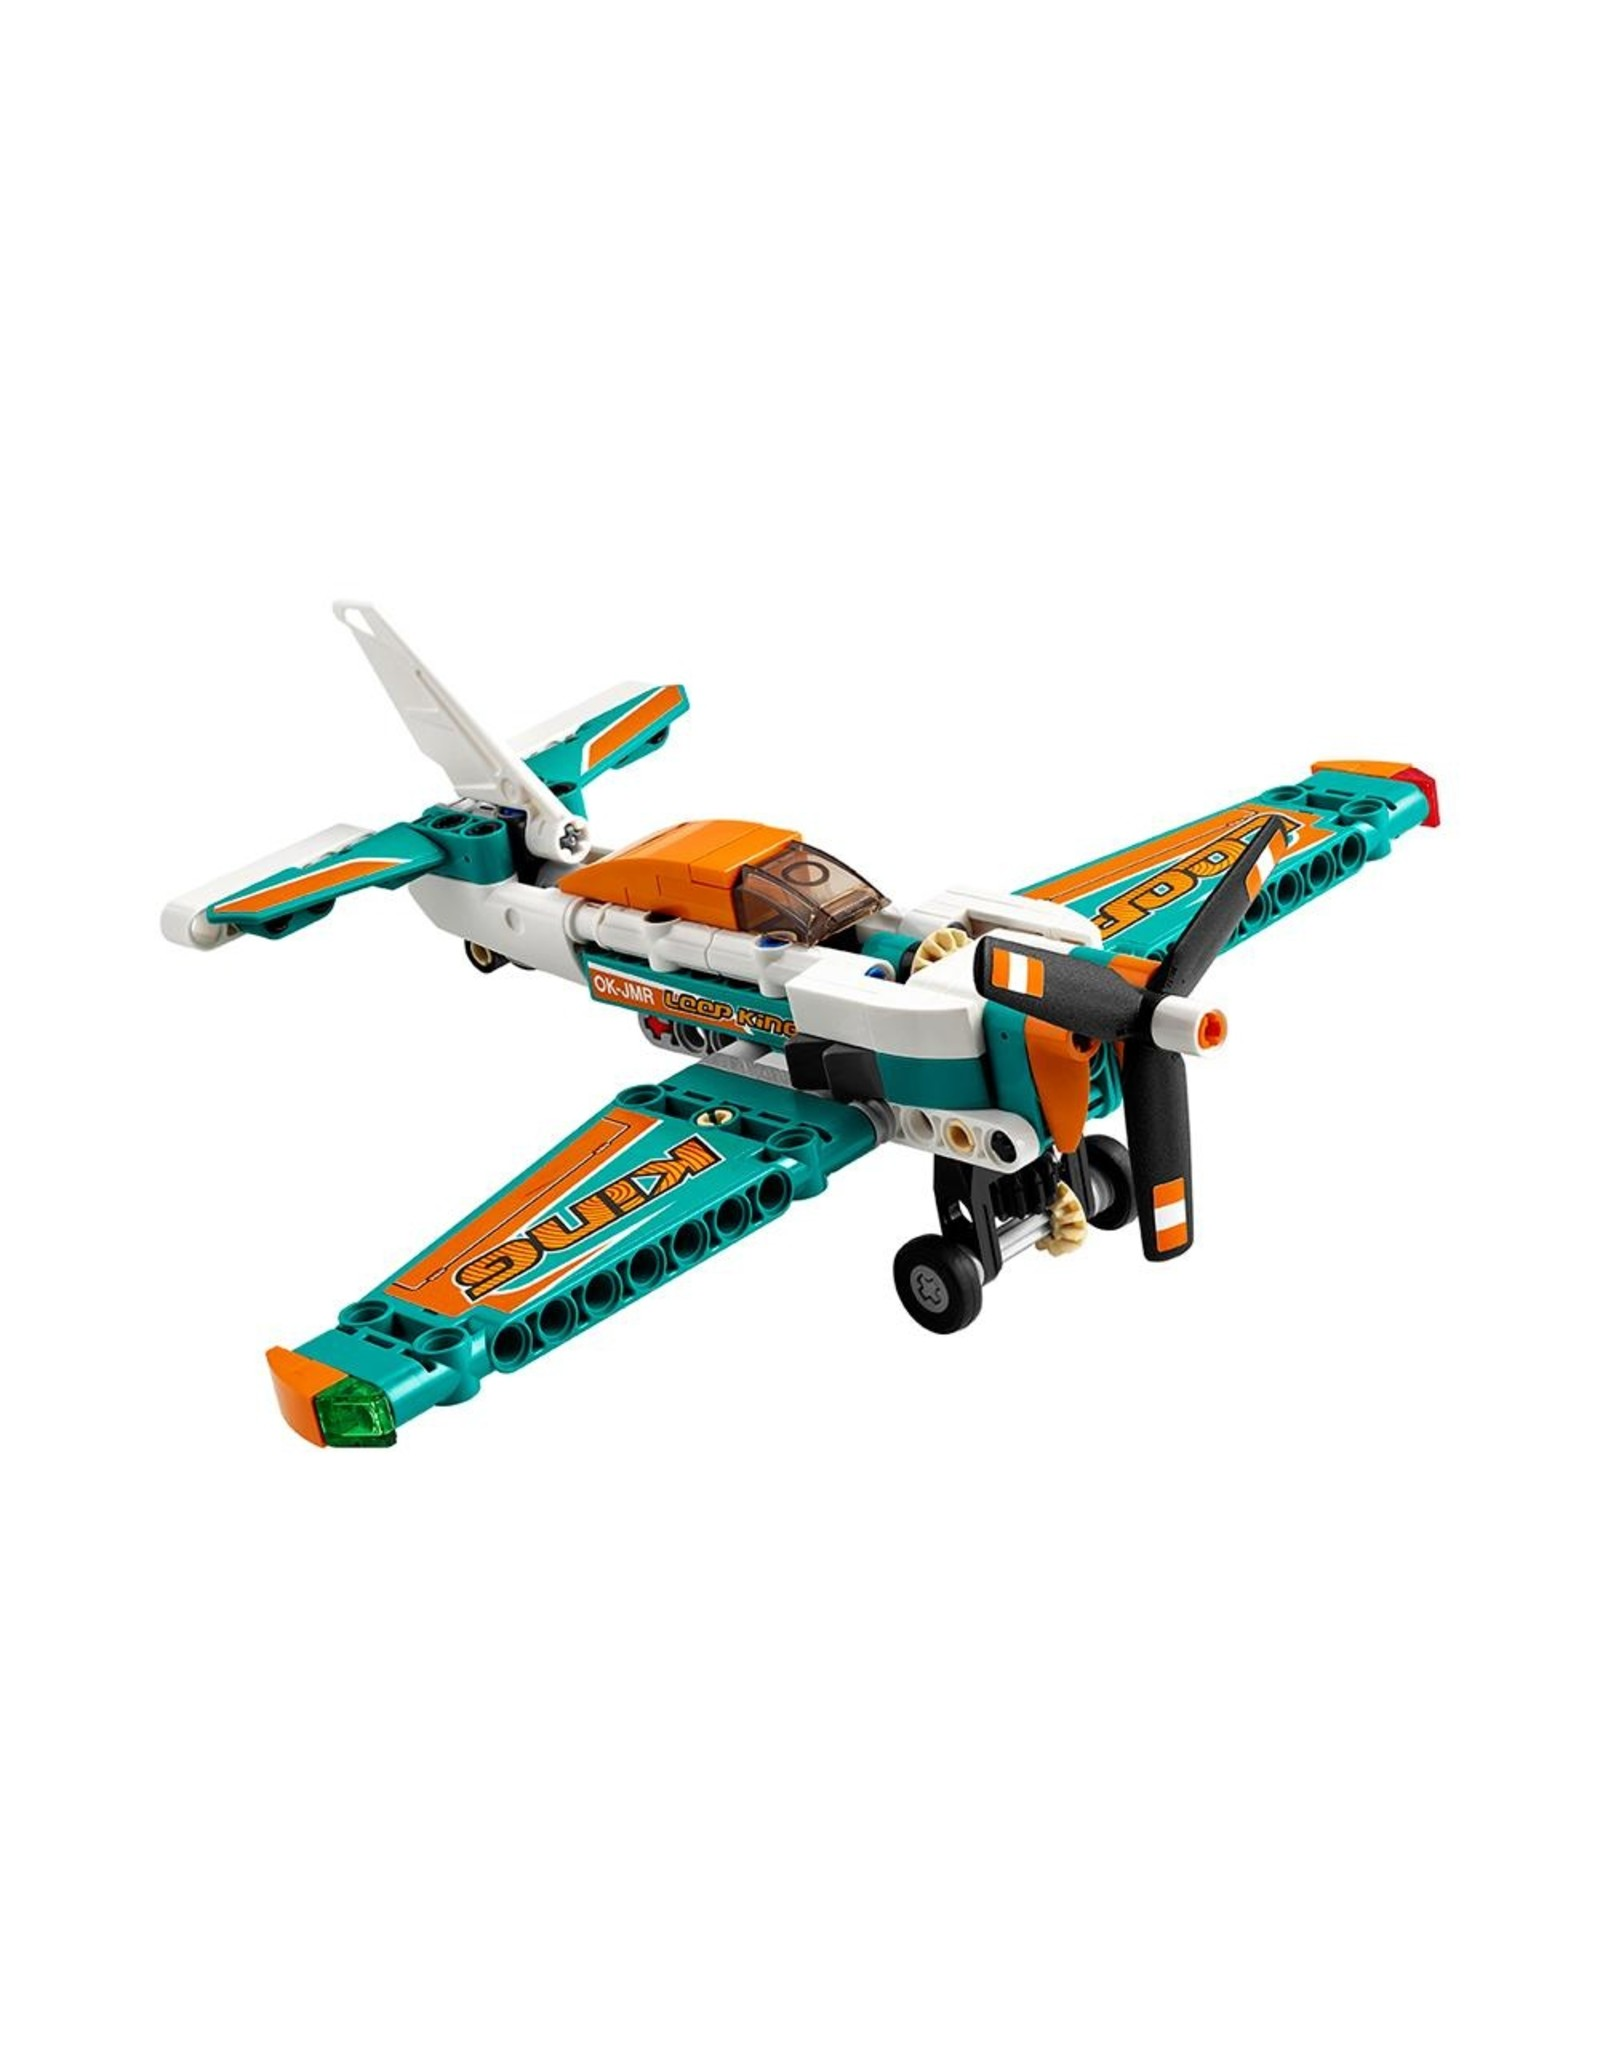 LEGO Technic - 42117 - Race Plane